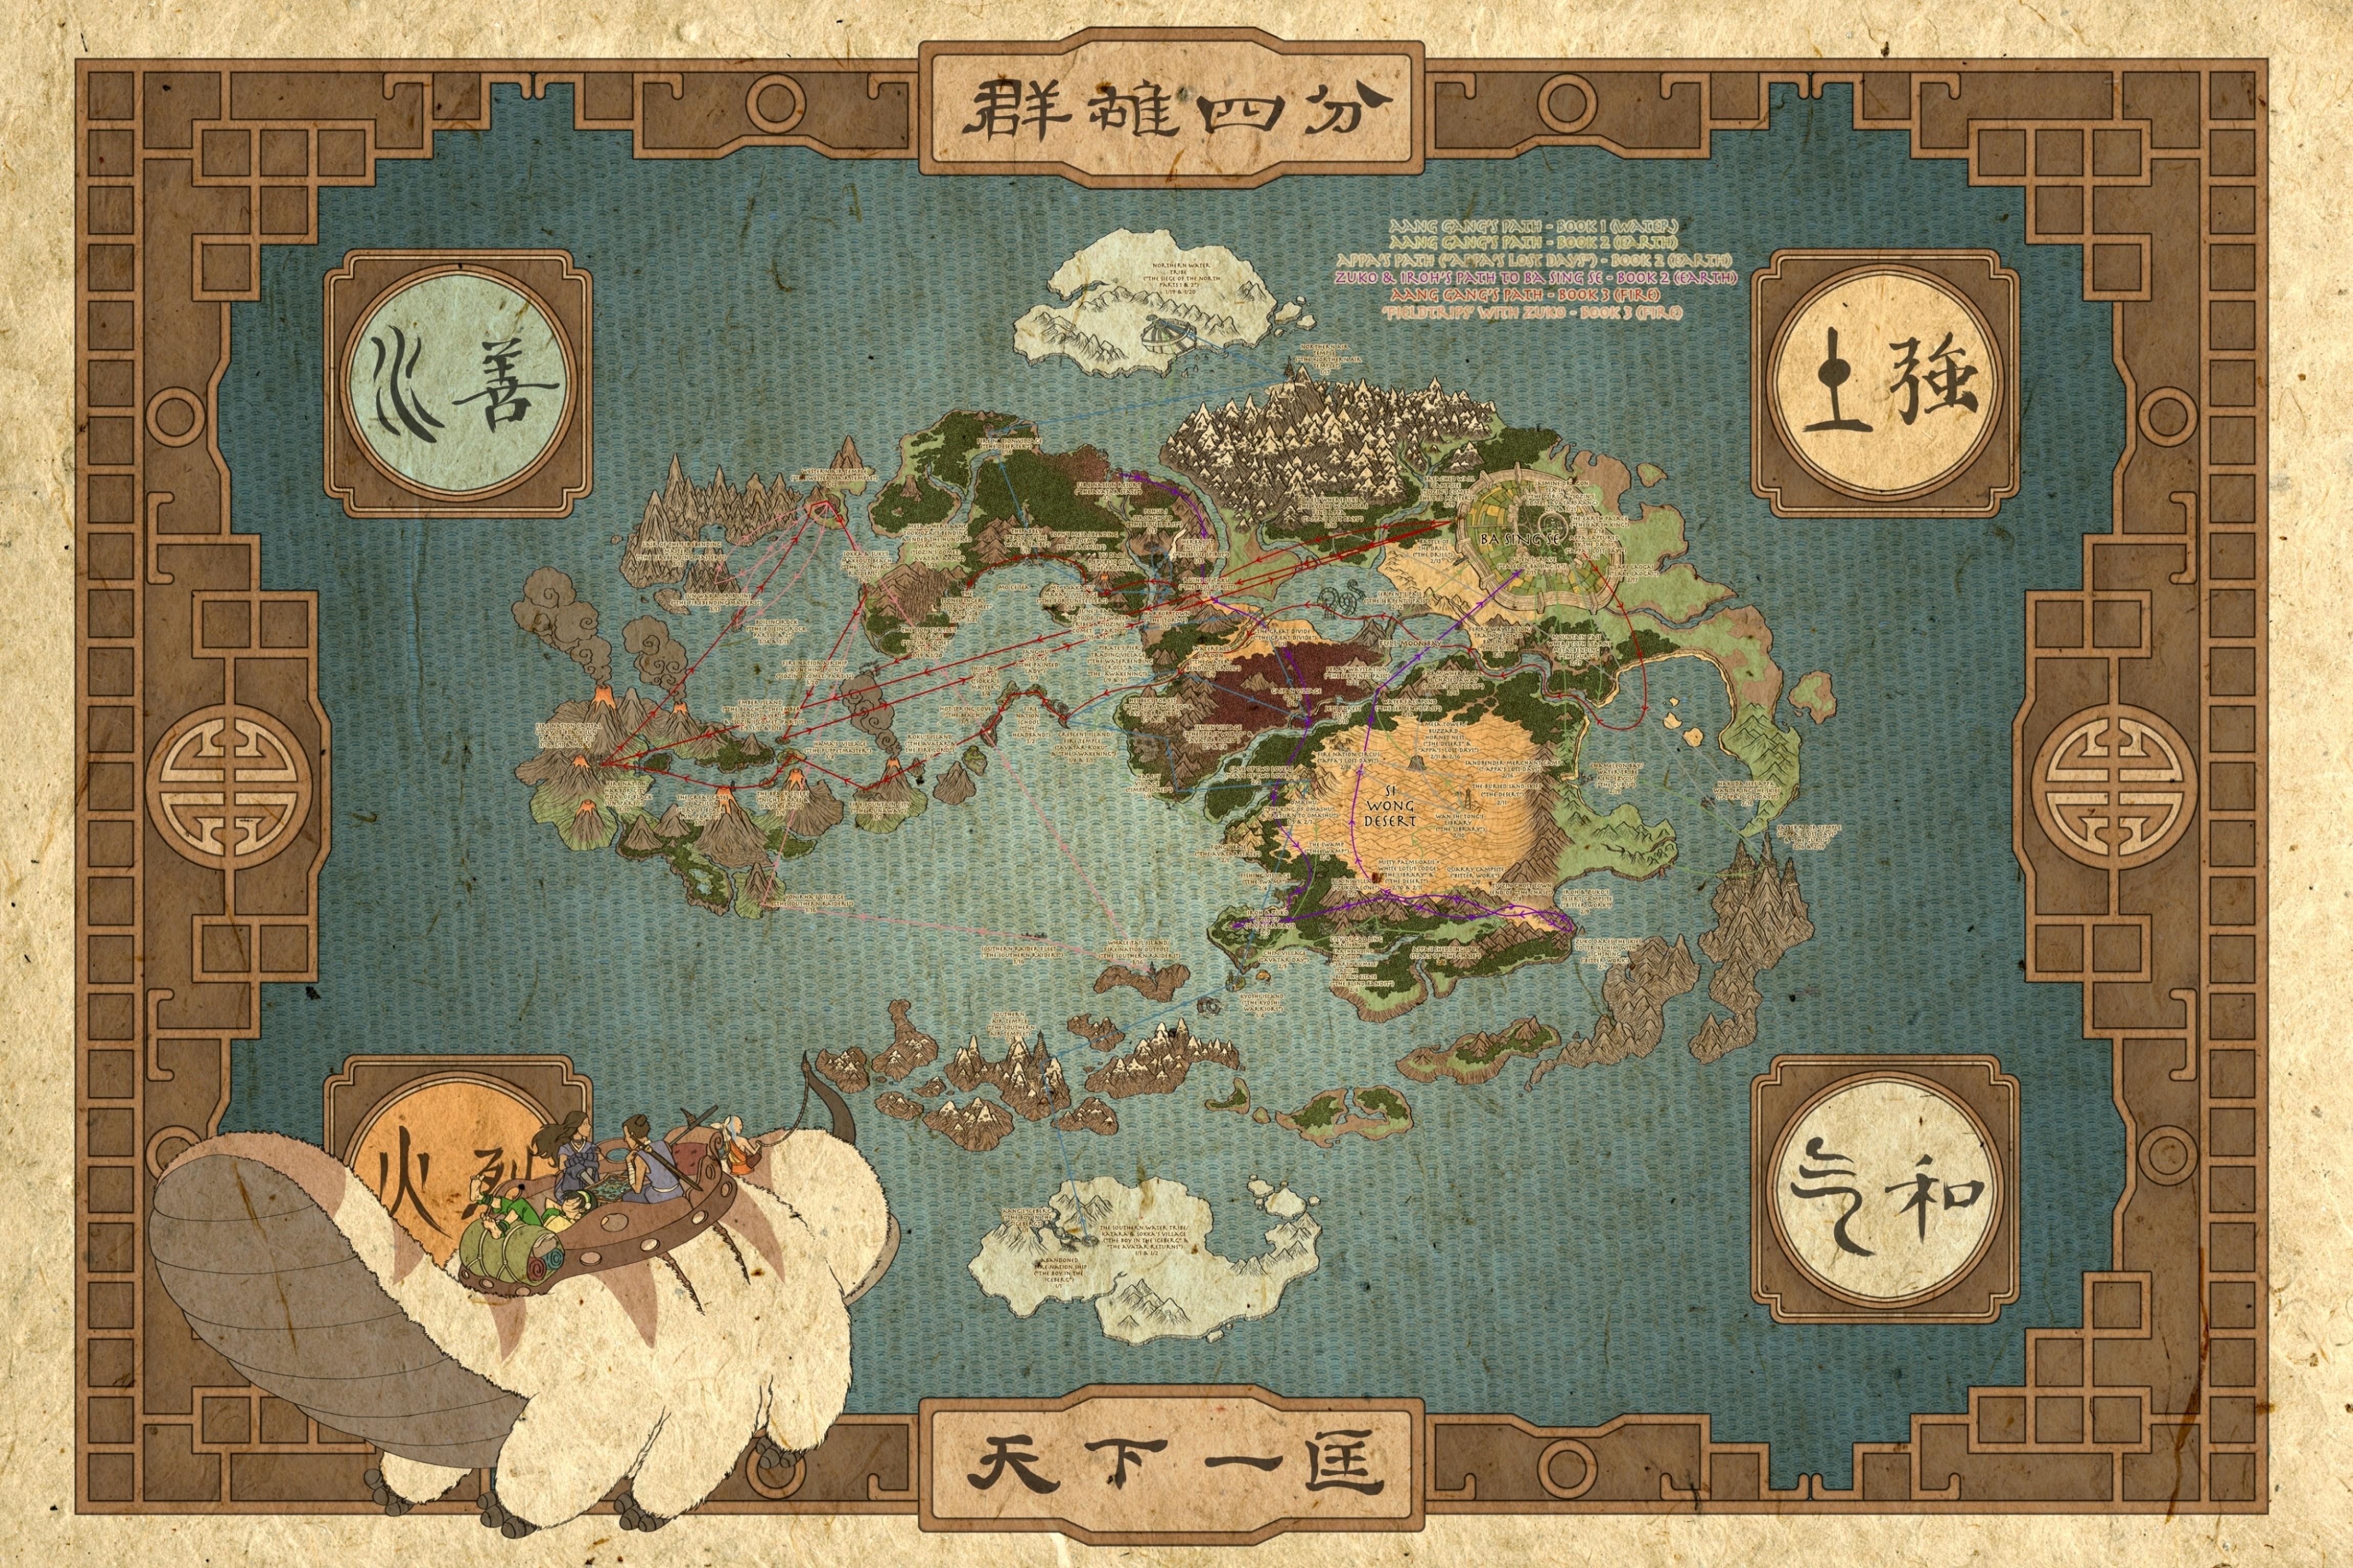 Illustration Pattern Map Avatar The Last Airbender ART Textile Tapestry Needlework